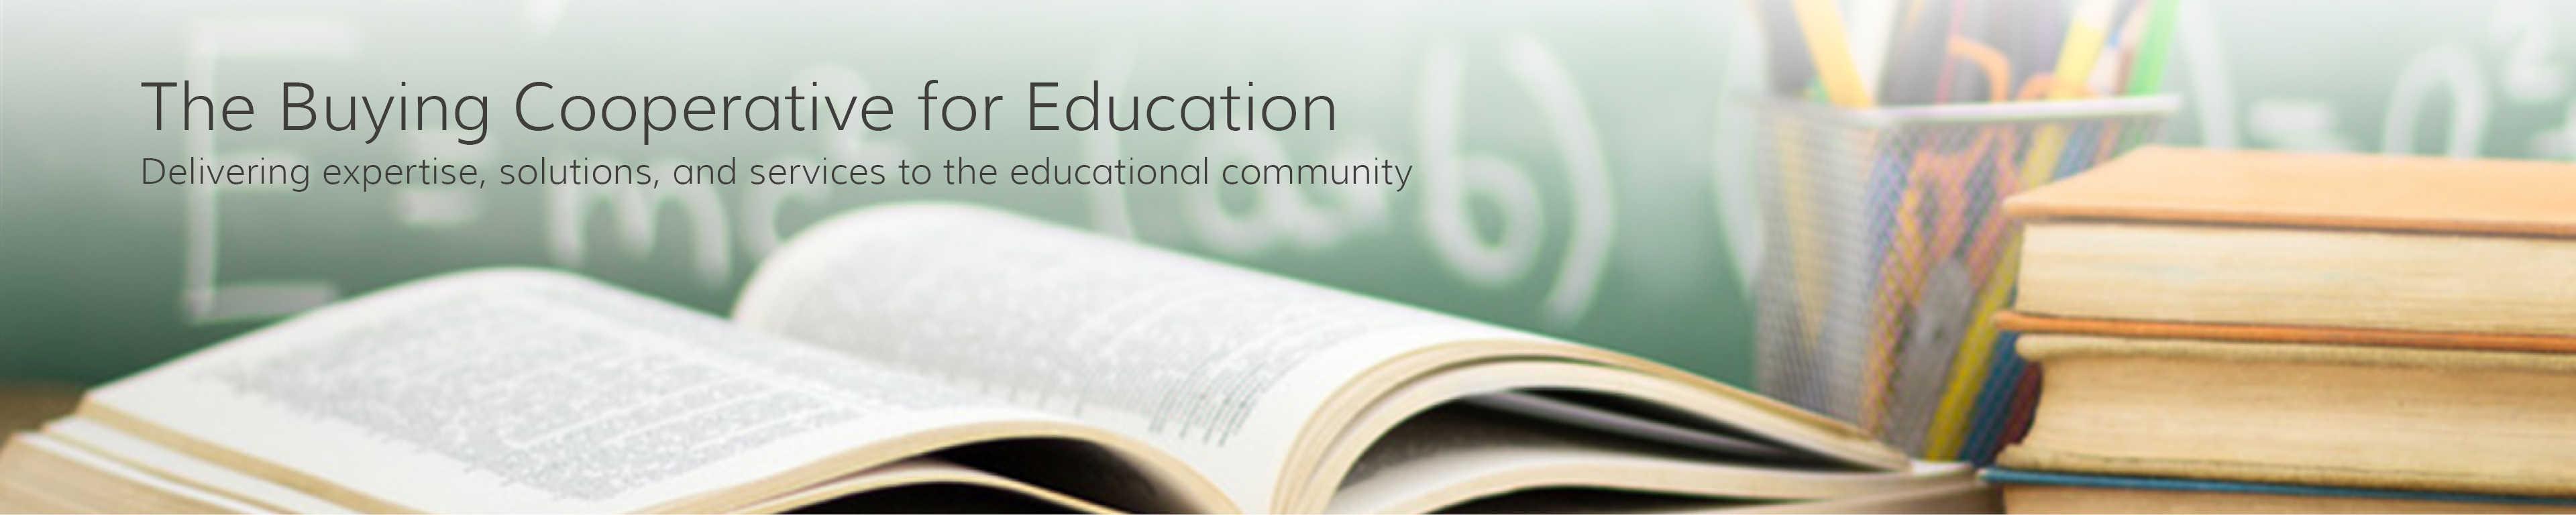 Educationslider_2016